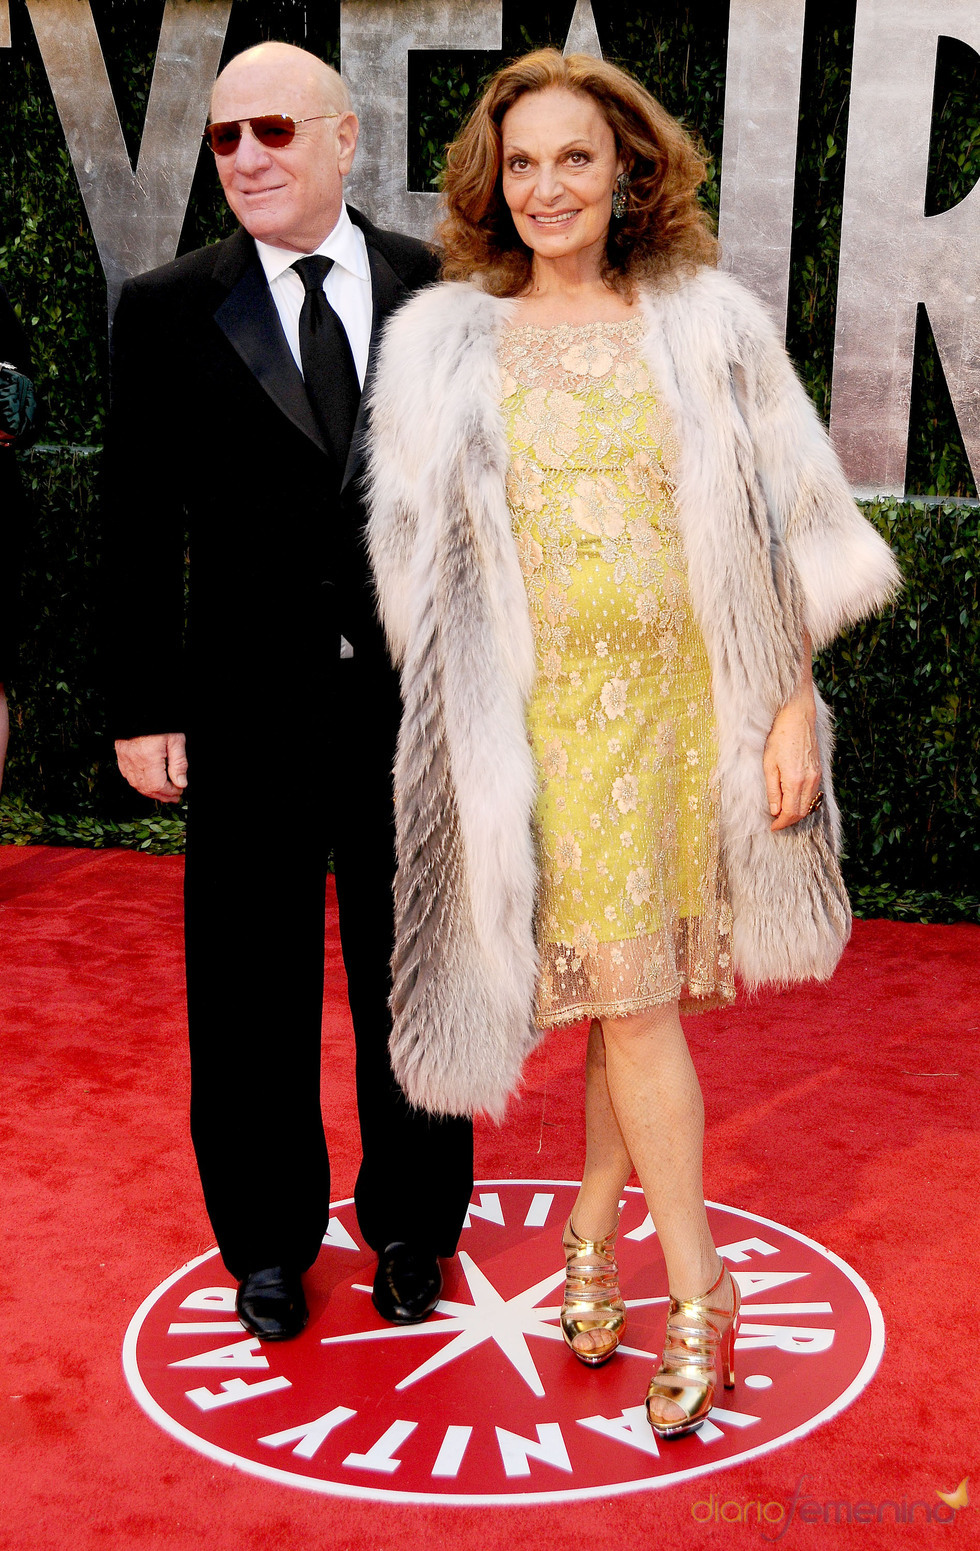 Diane von Furstenberg y Barry Diller en la fiesta Vanity Fair Oscar 2010